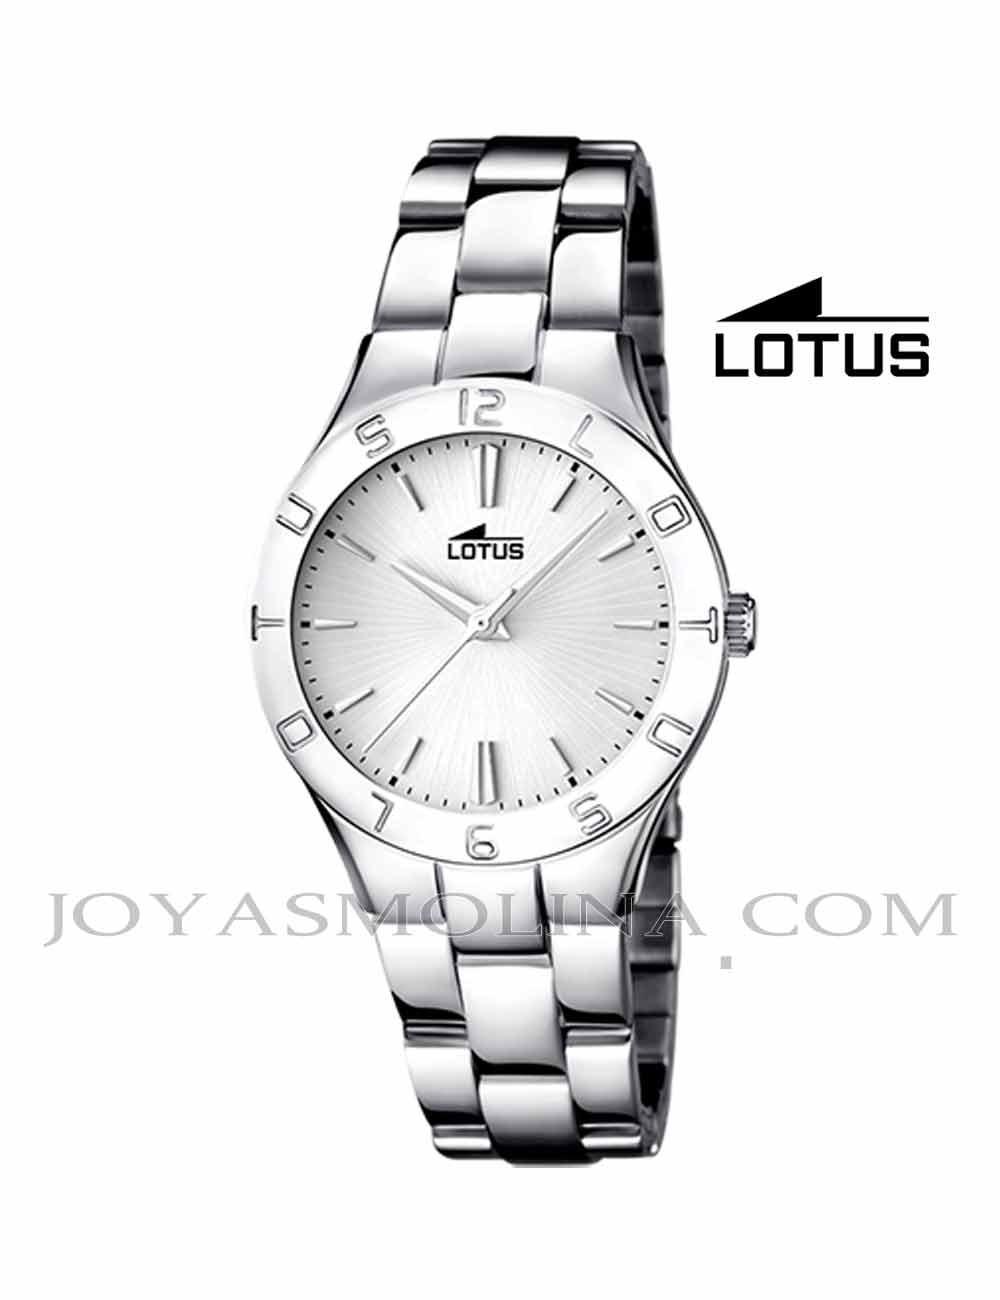 Reloj Lotus mujer cadena esfera blanca